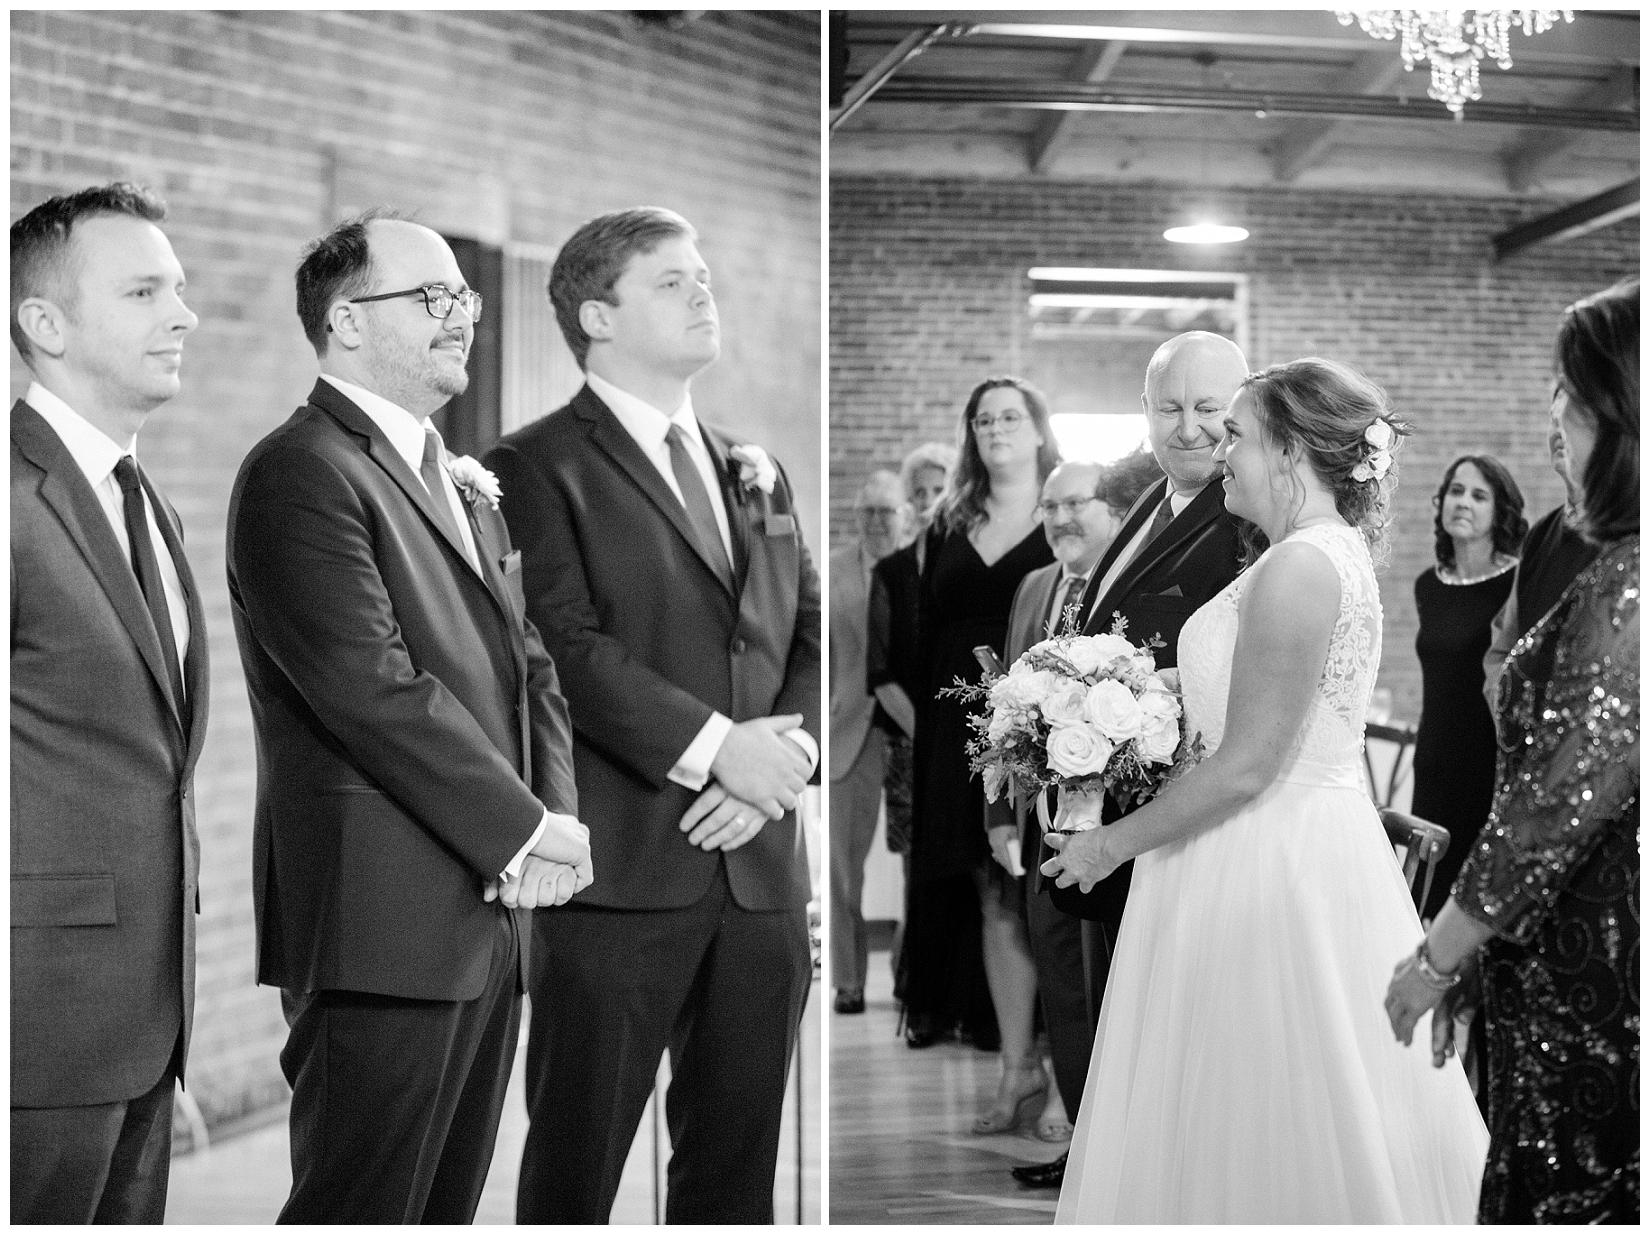 cat-alkire-wedding-photographer-indiana-chicago-indianapolis-fort-wayne_0943.jpg